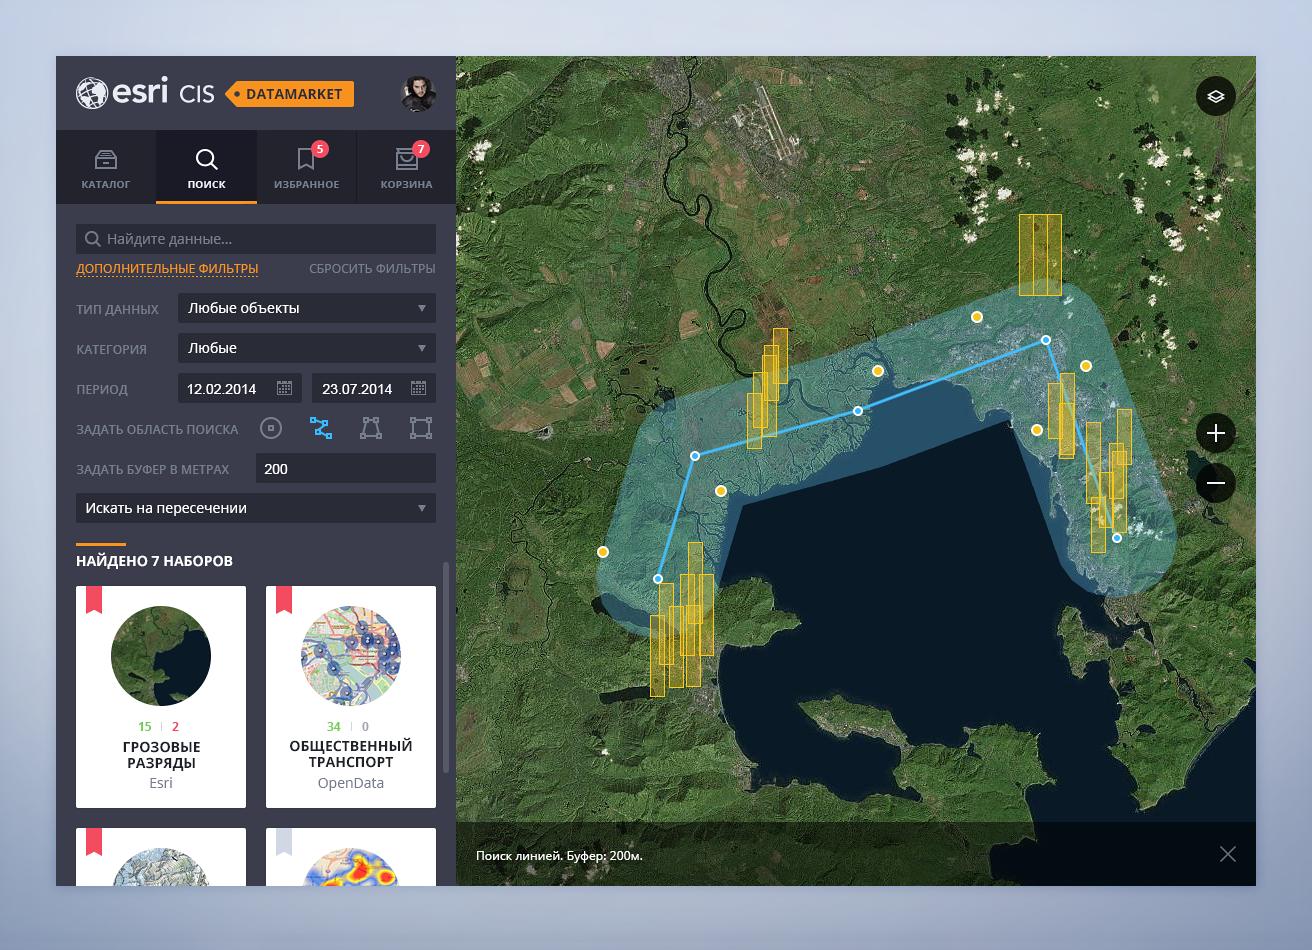 Esri market spatialsearch